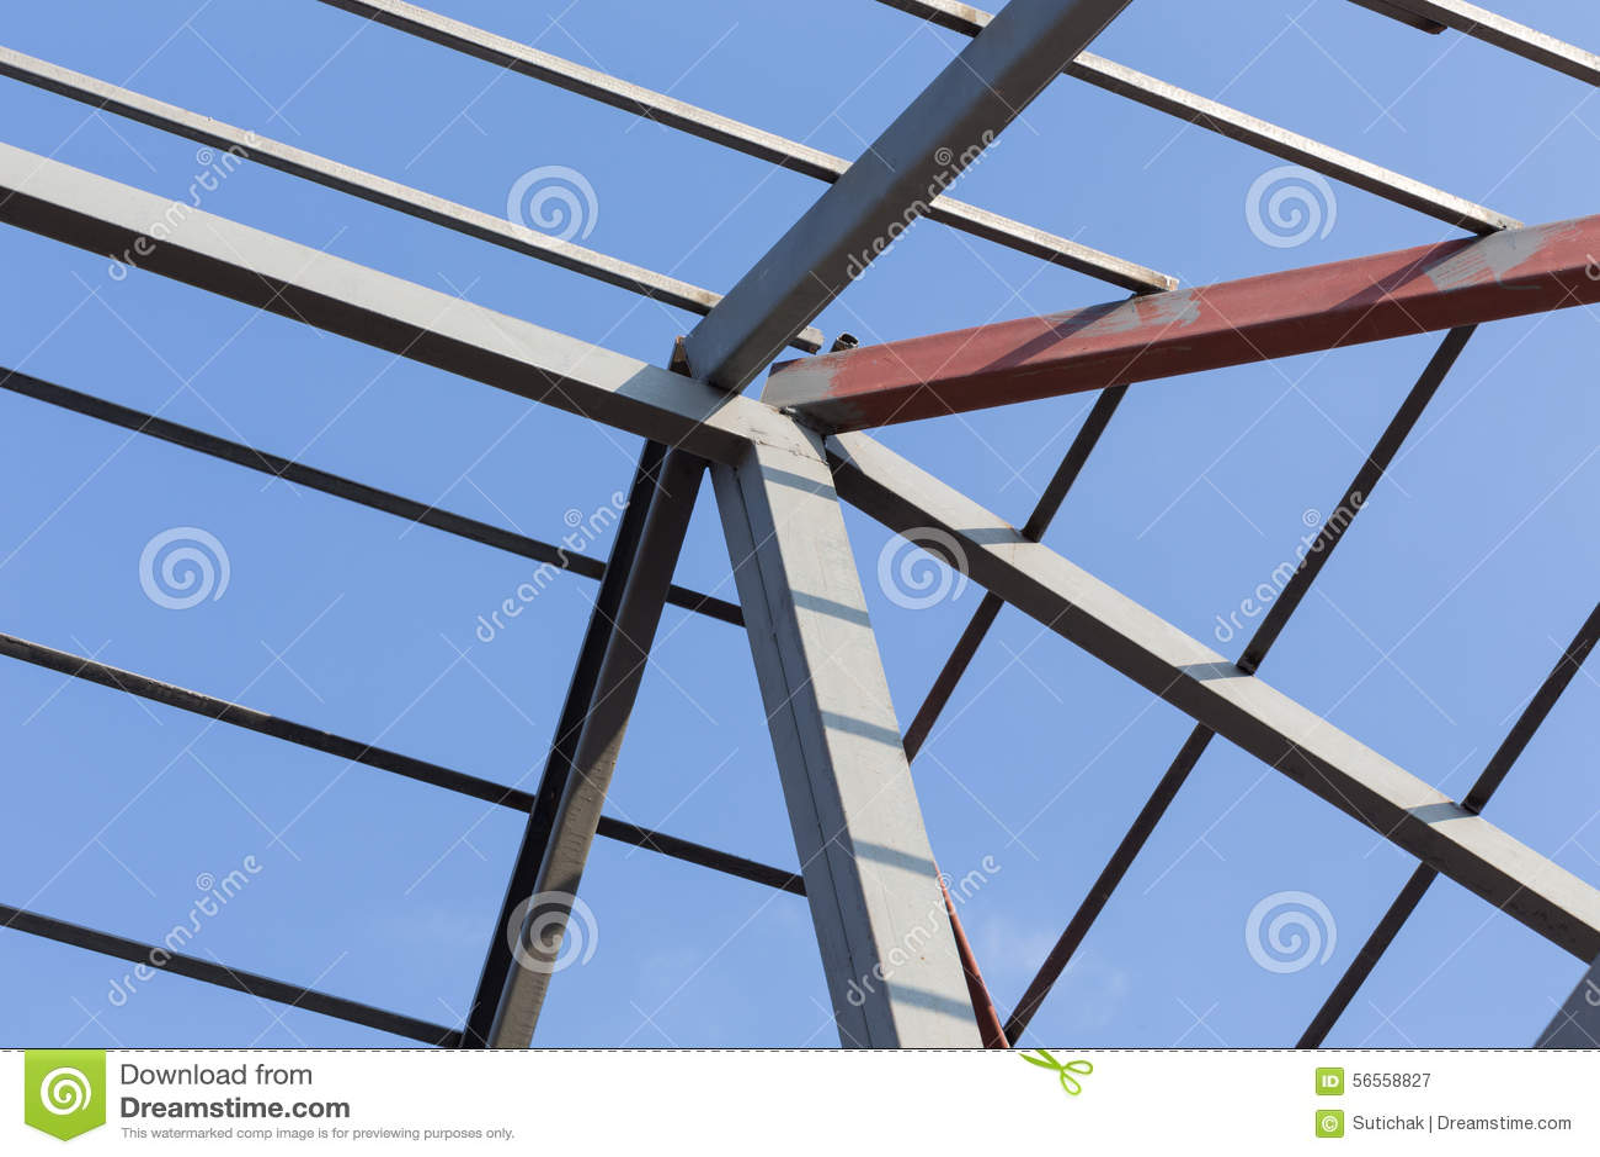 Download Οικοδόμηση κατοικημένου κτηρίου ζευκτόντων στεγών ακτίνων χάλυβα Στοκ Εικόνα - εικόνα από αρχιτεκτονικής, δοκός: 56558827